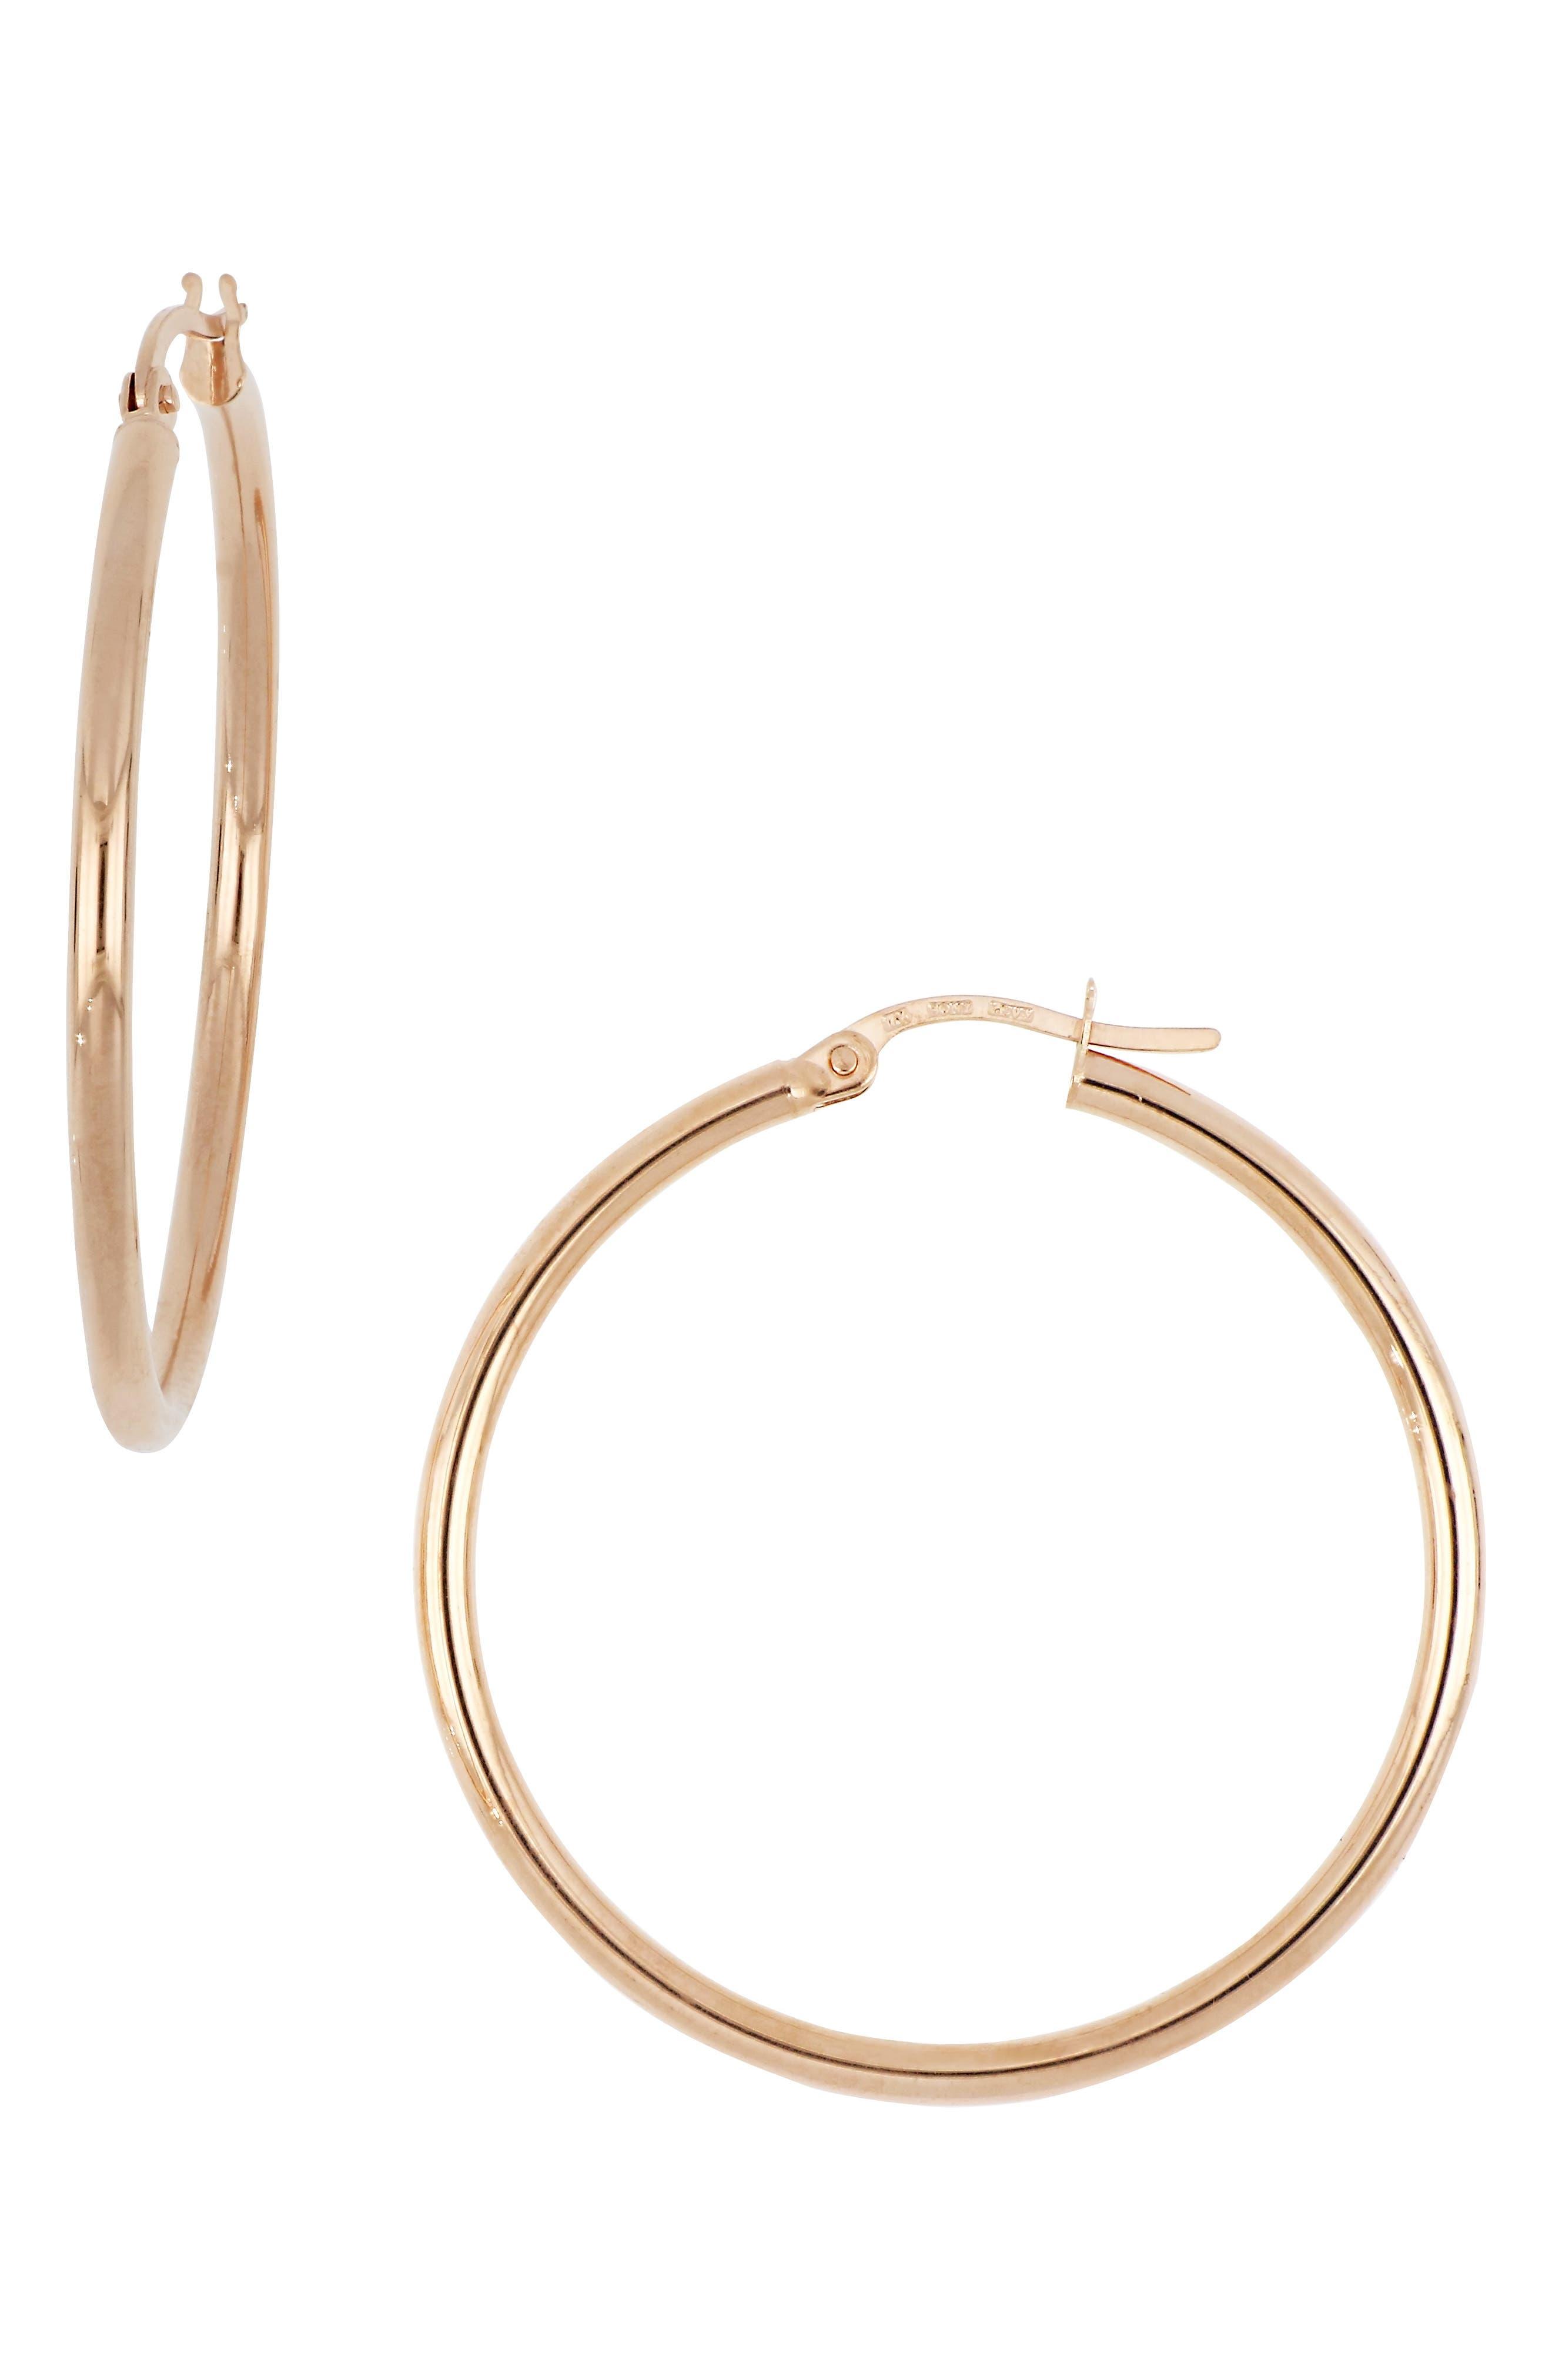 14k Gold Hoop Earrings, 32mm, Main, color, ROSE GOLD